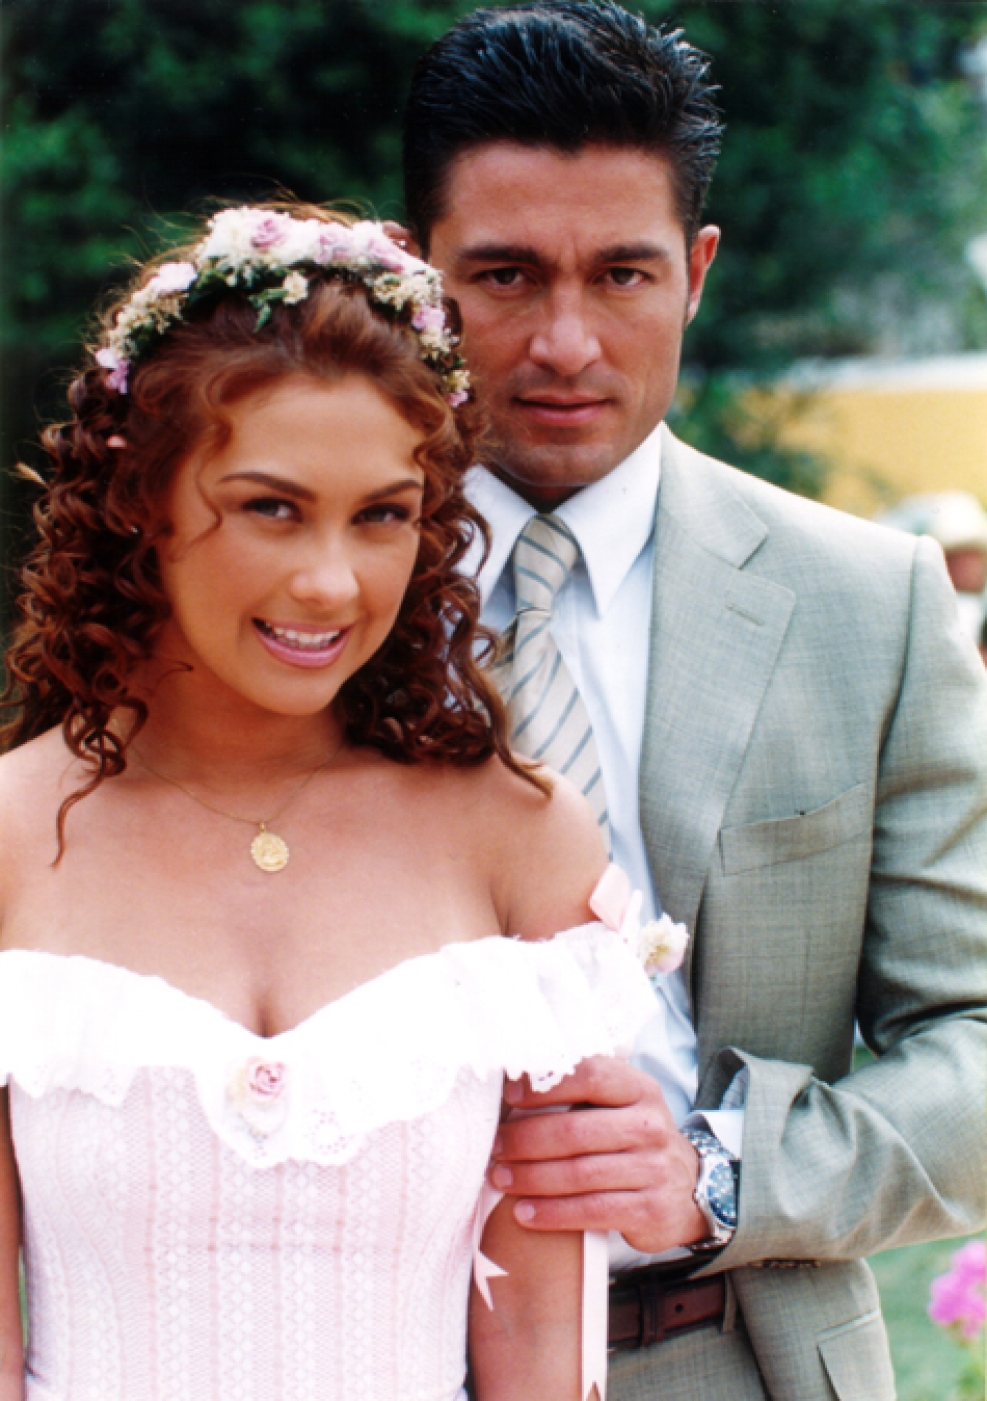 https://media.telemundochicago.com/images/987*1401/fernando-colunga-mezcalent-02.jpg